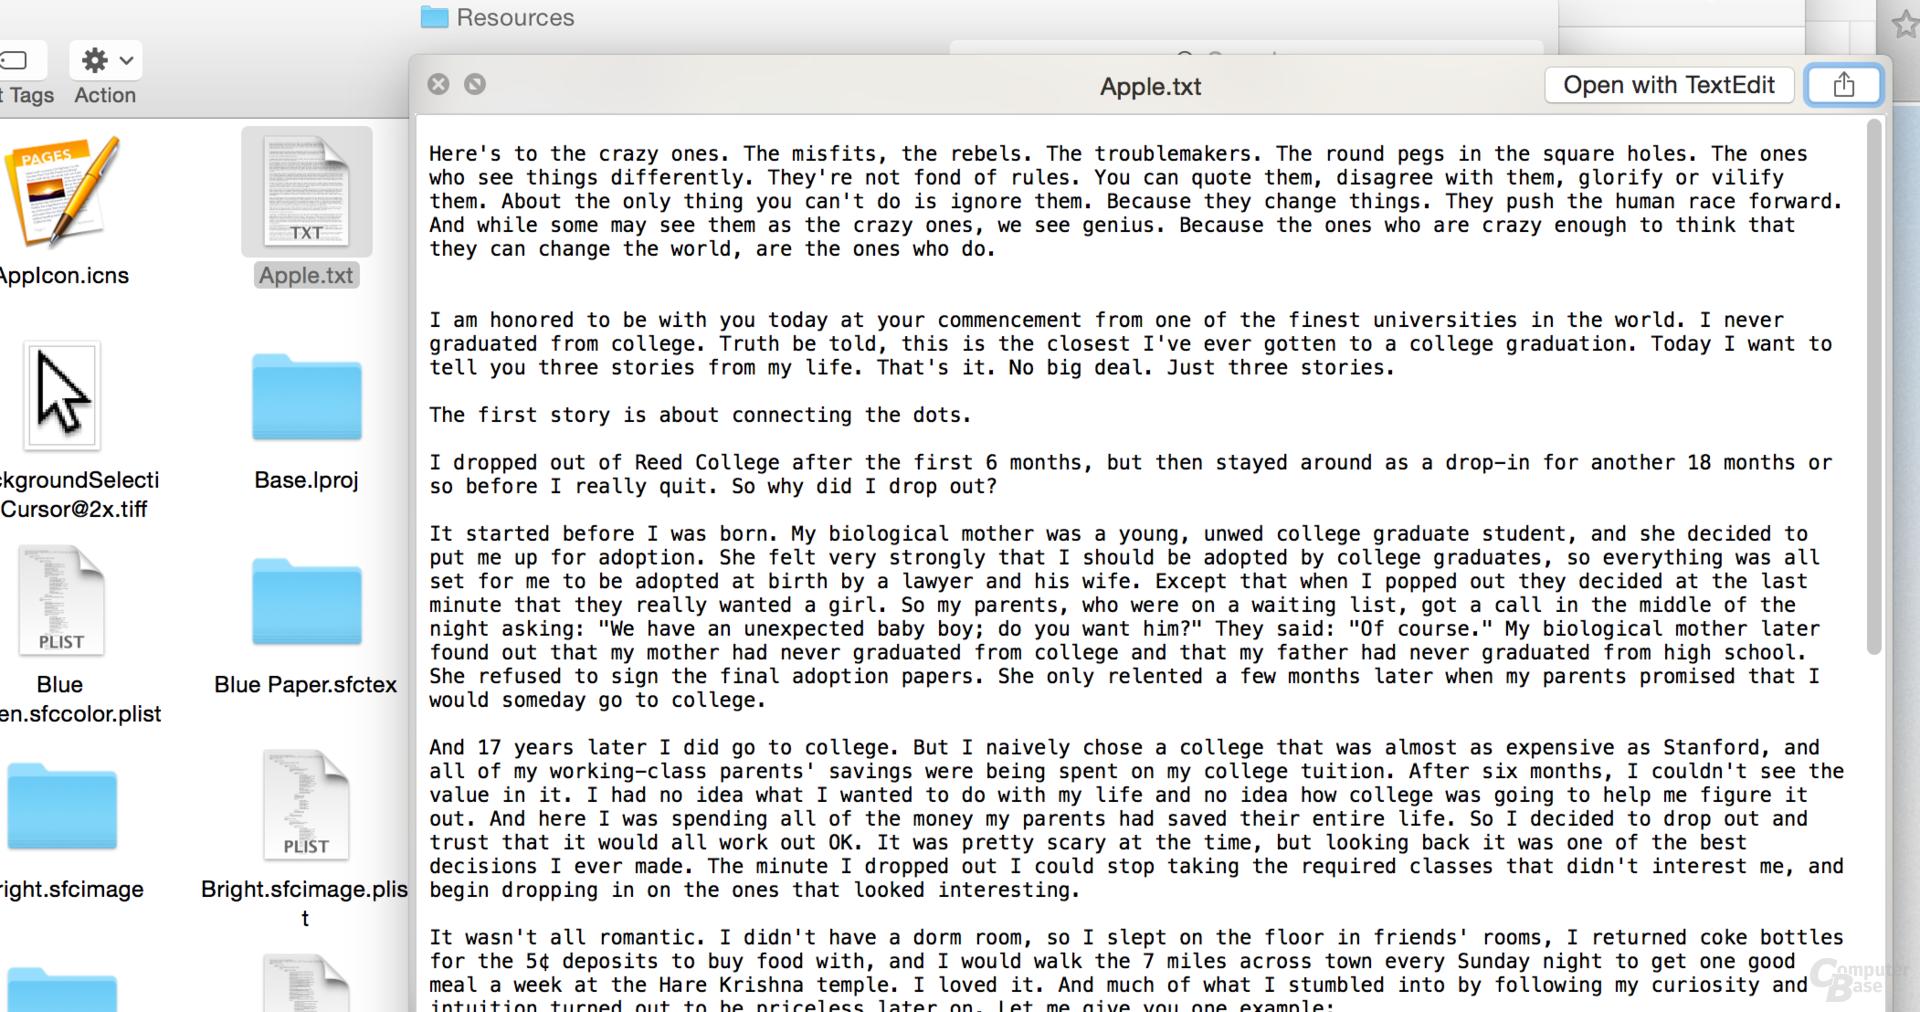 Steve Jobs Rede vor Studenten in Pages